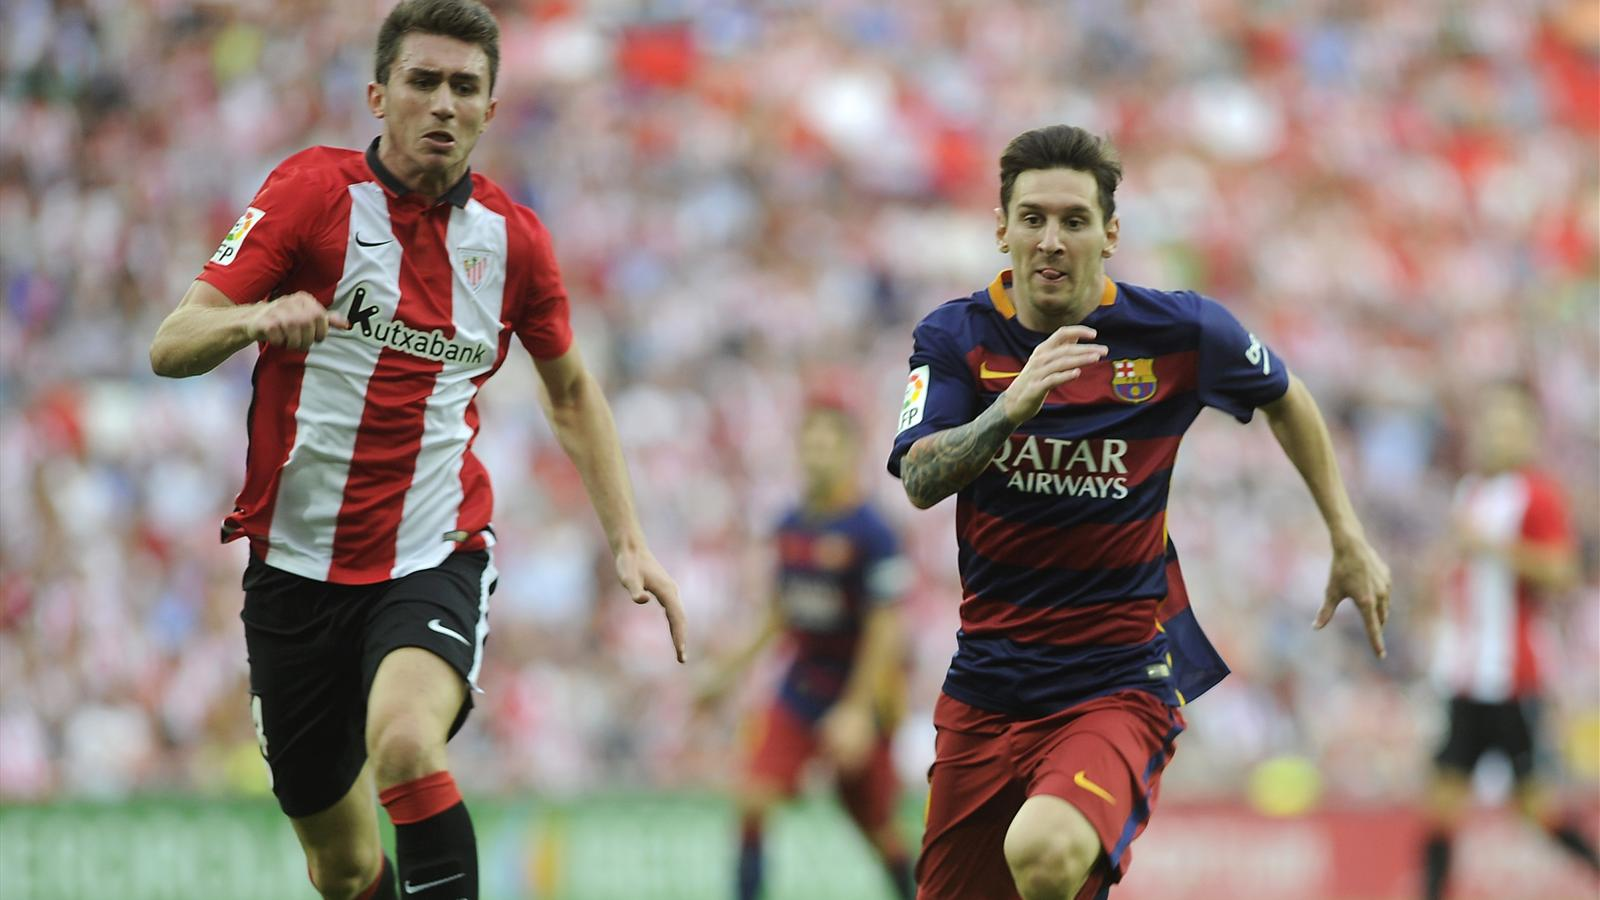 Aymeric Laporte, Leo Messi - Athletic Bilbao - FC Barcelona - Liga 2015-2016